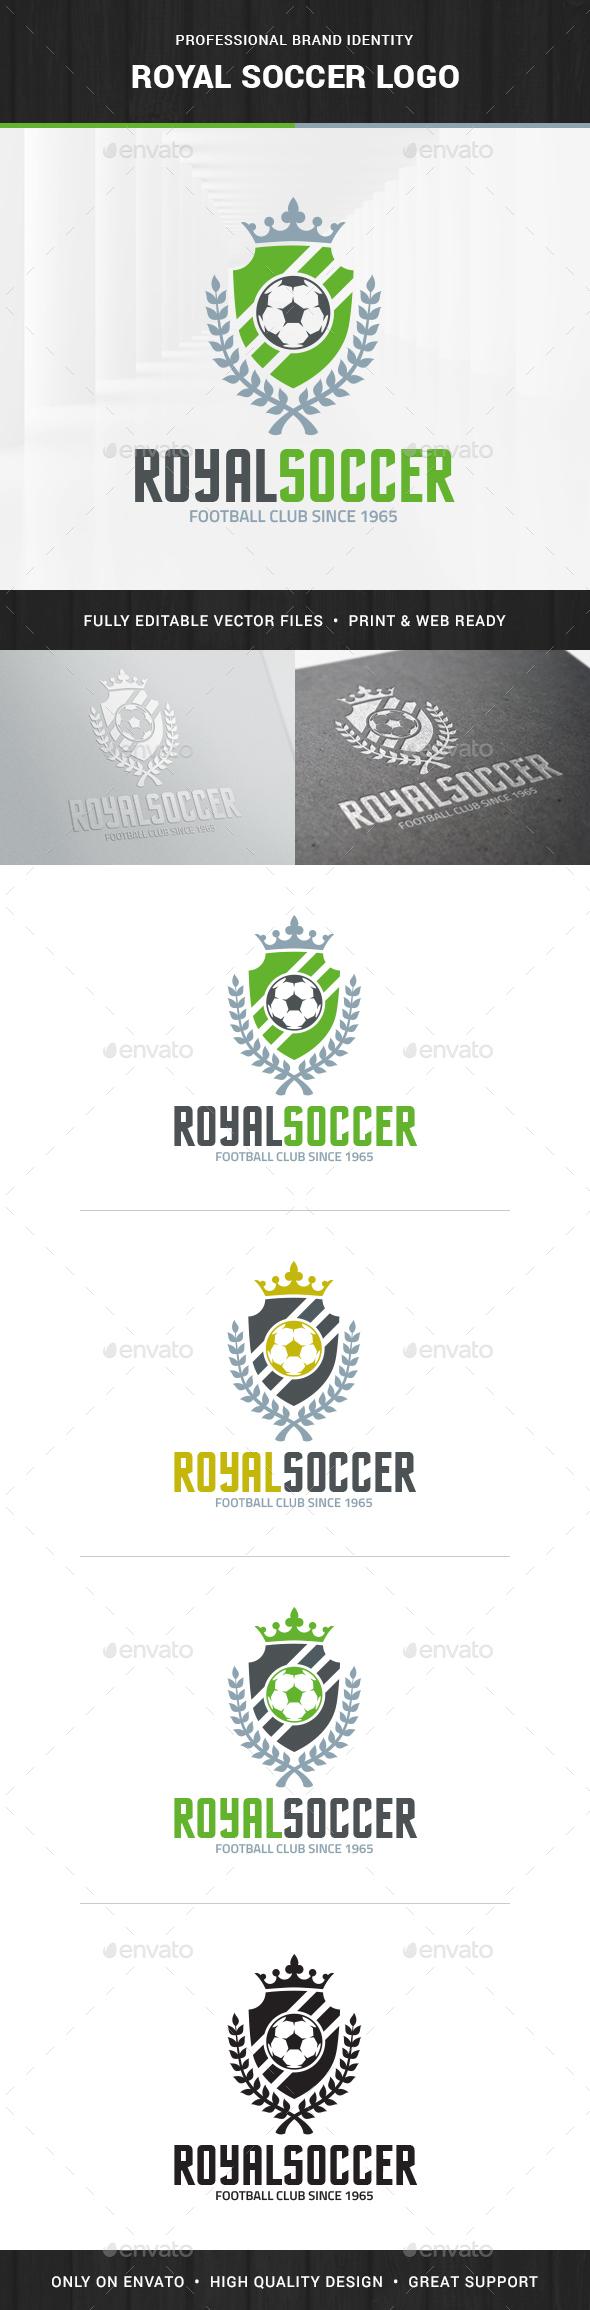 Royal Soccer Logo Template - Crests Logo Templates